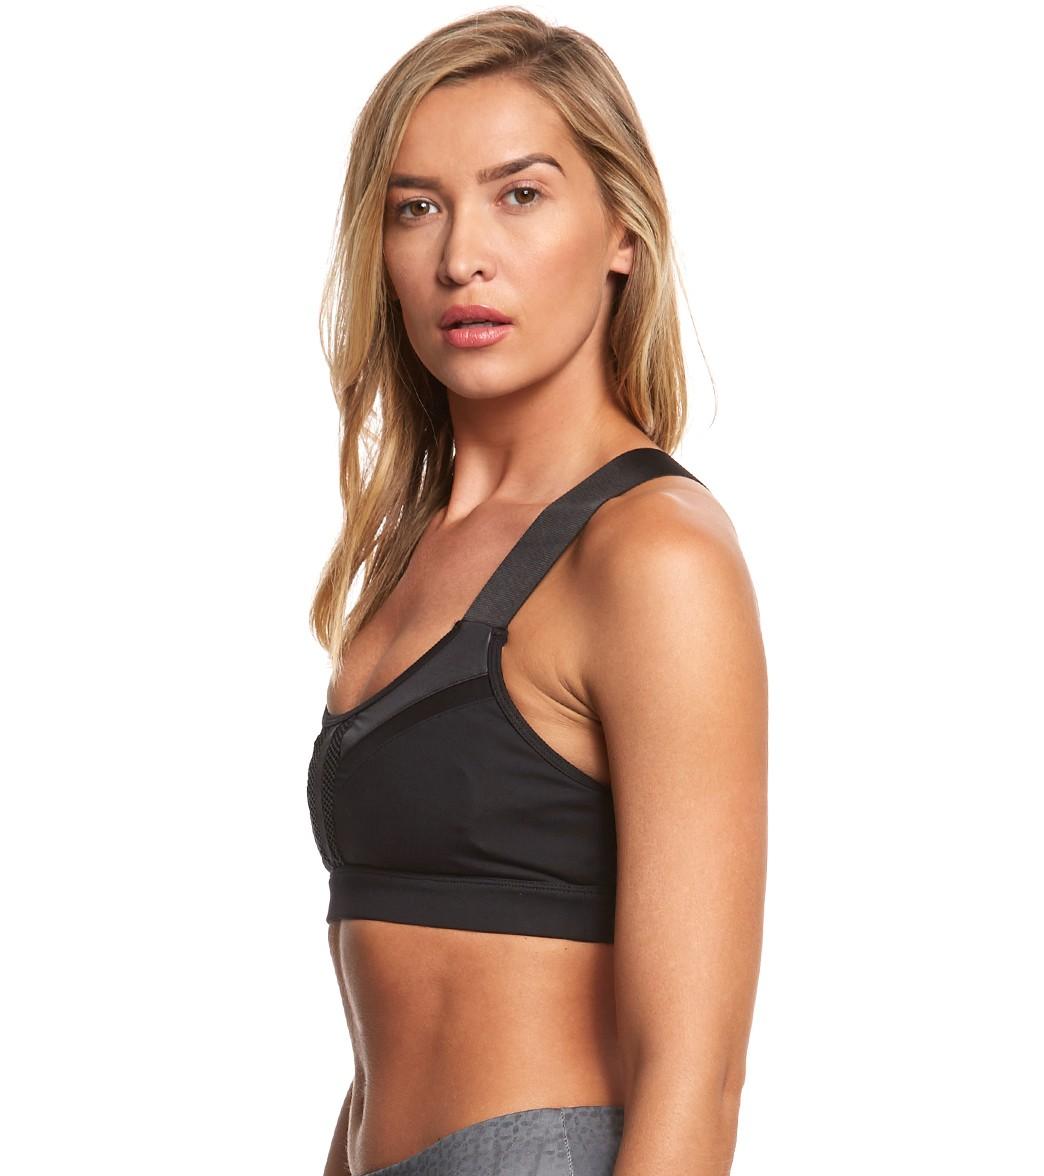 96630da68a Alo Yoga Equalize Yoga Sports Bra at YogaOutlet.com - Free Shipping